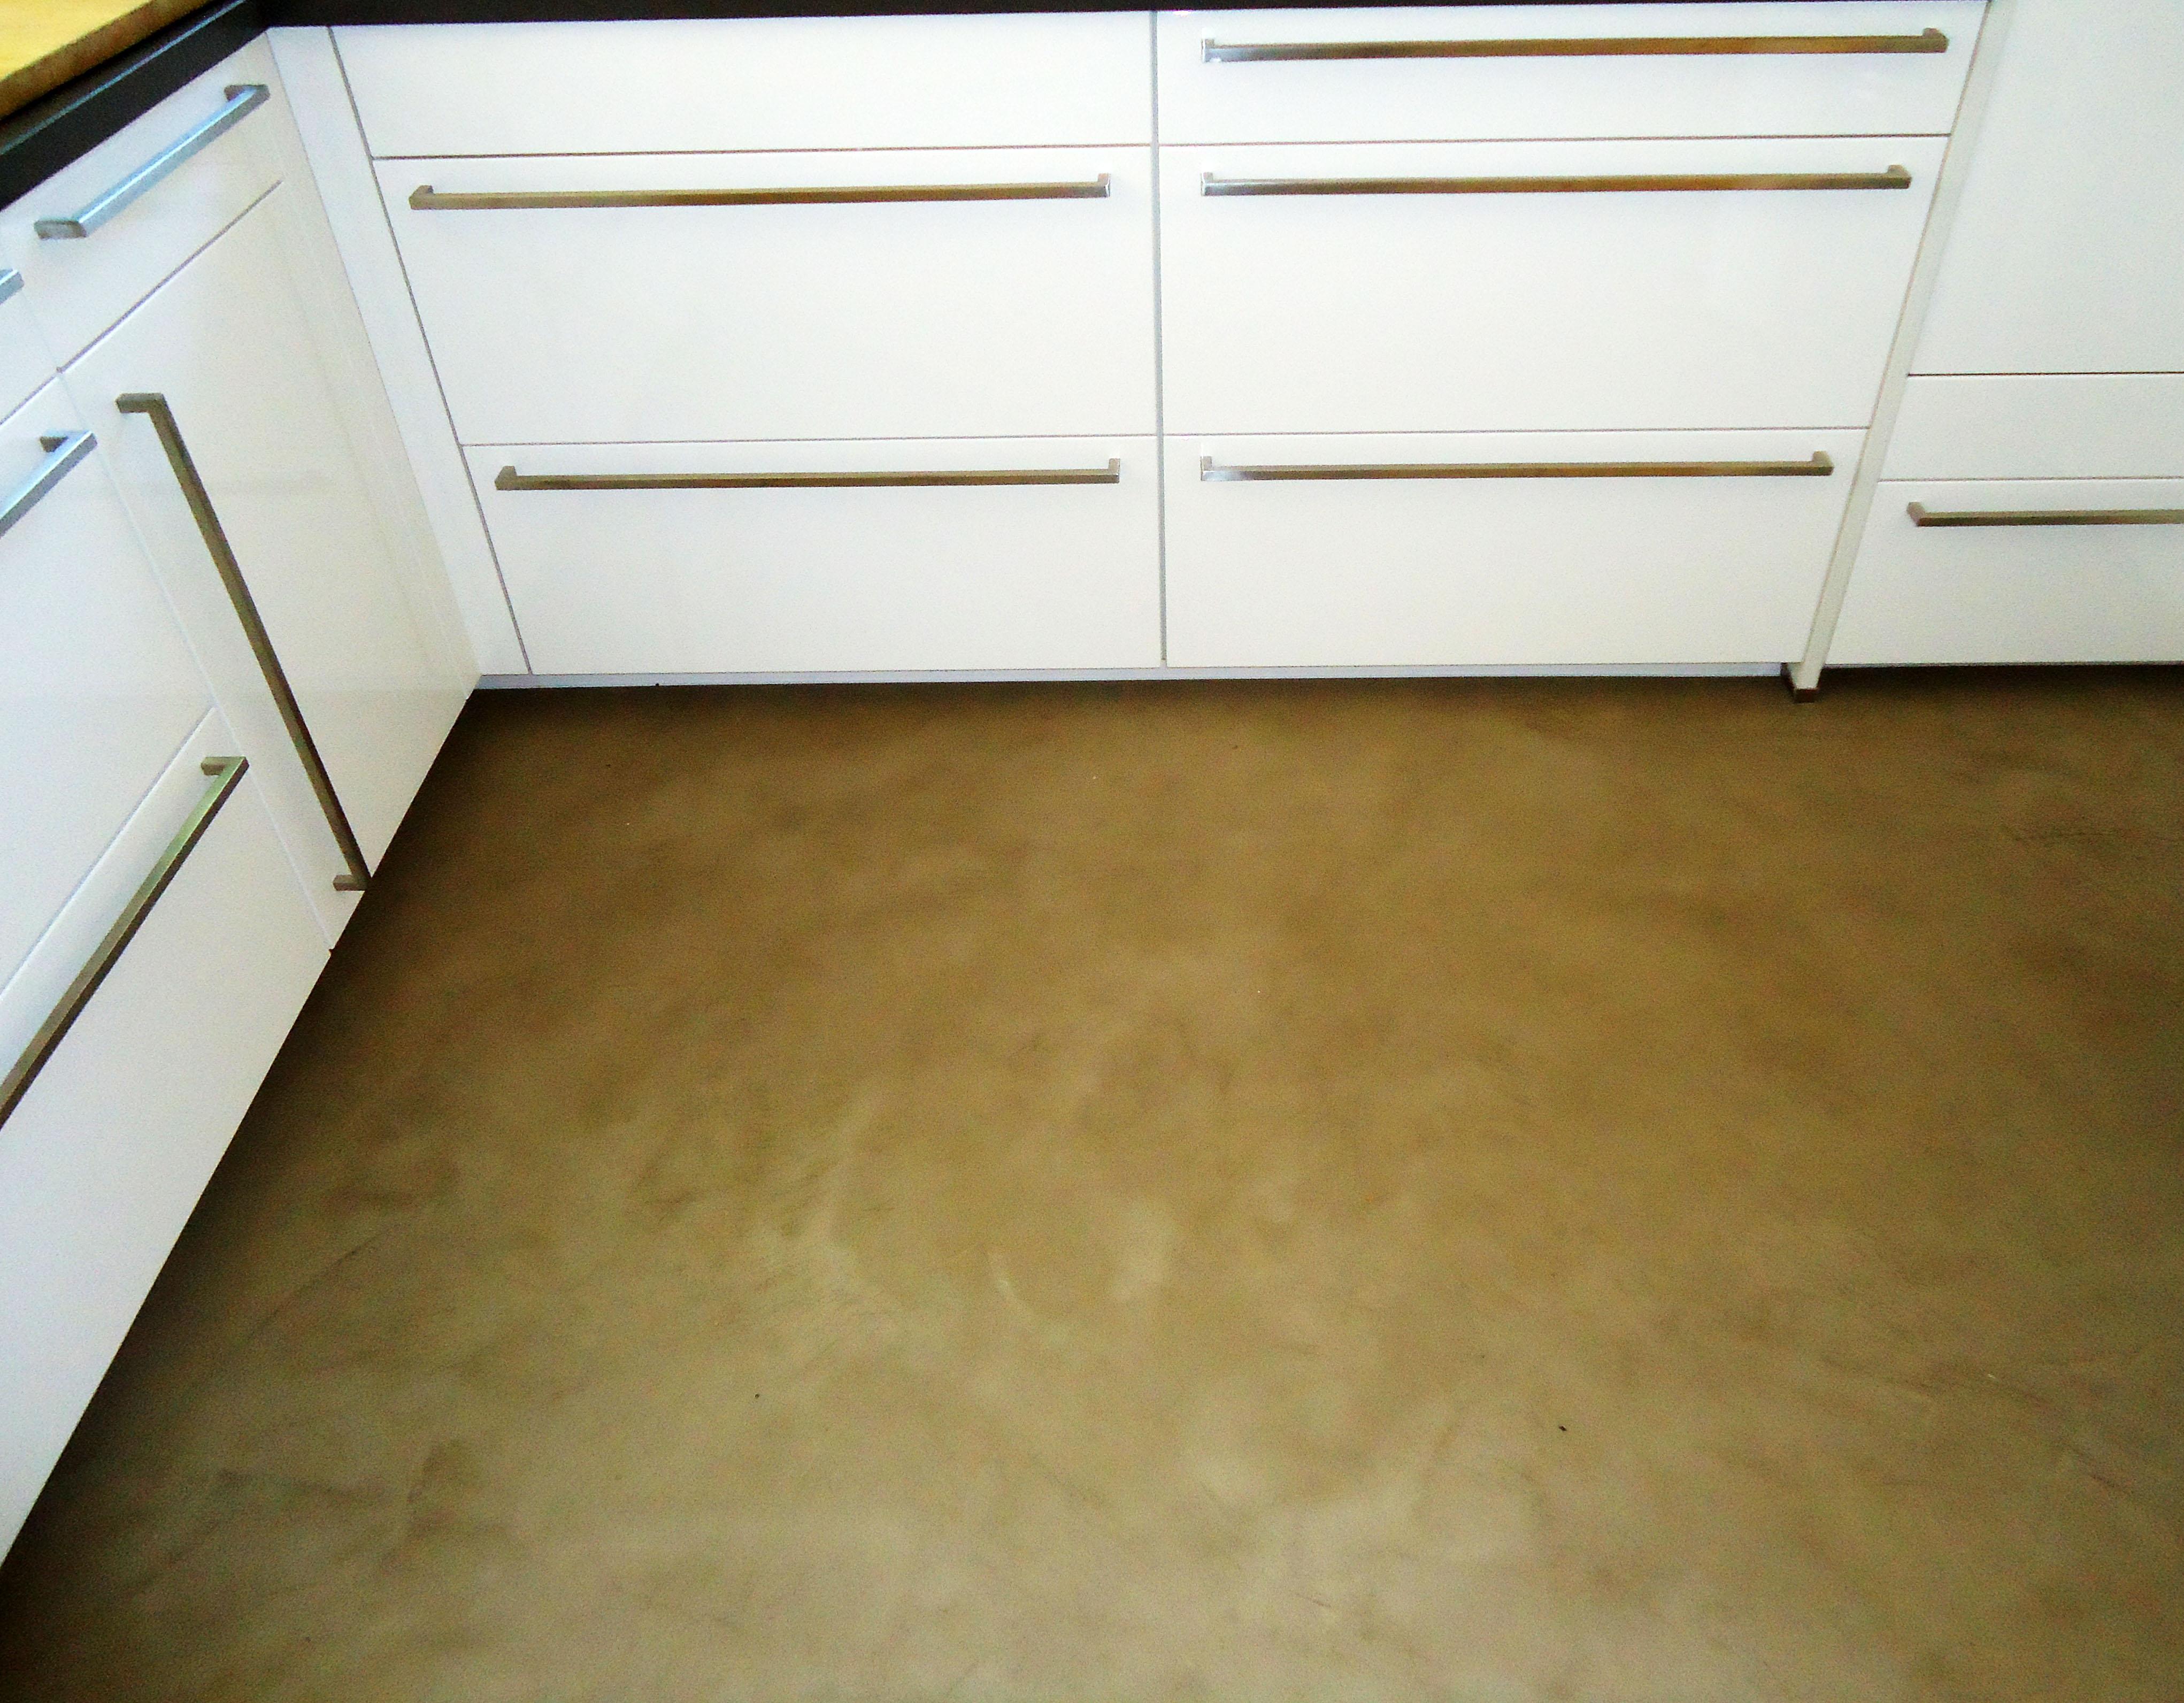 Holzfußboden Aufbau Detail ~ Fußboden sanieren aufbau dämmung bodenplatte varianten im